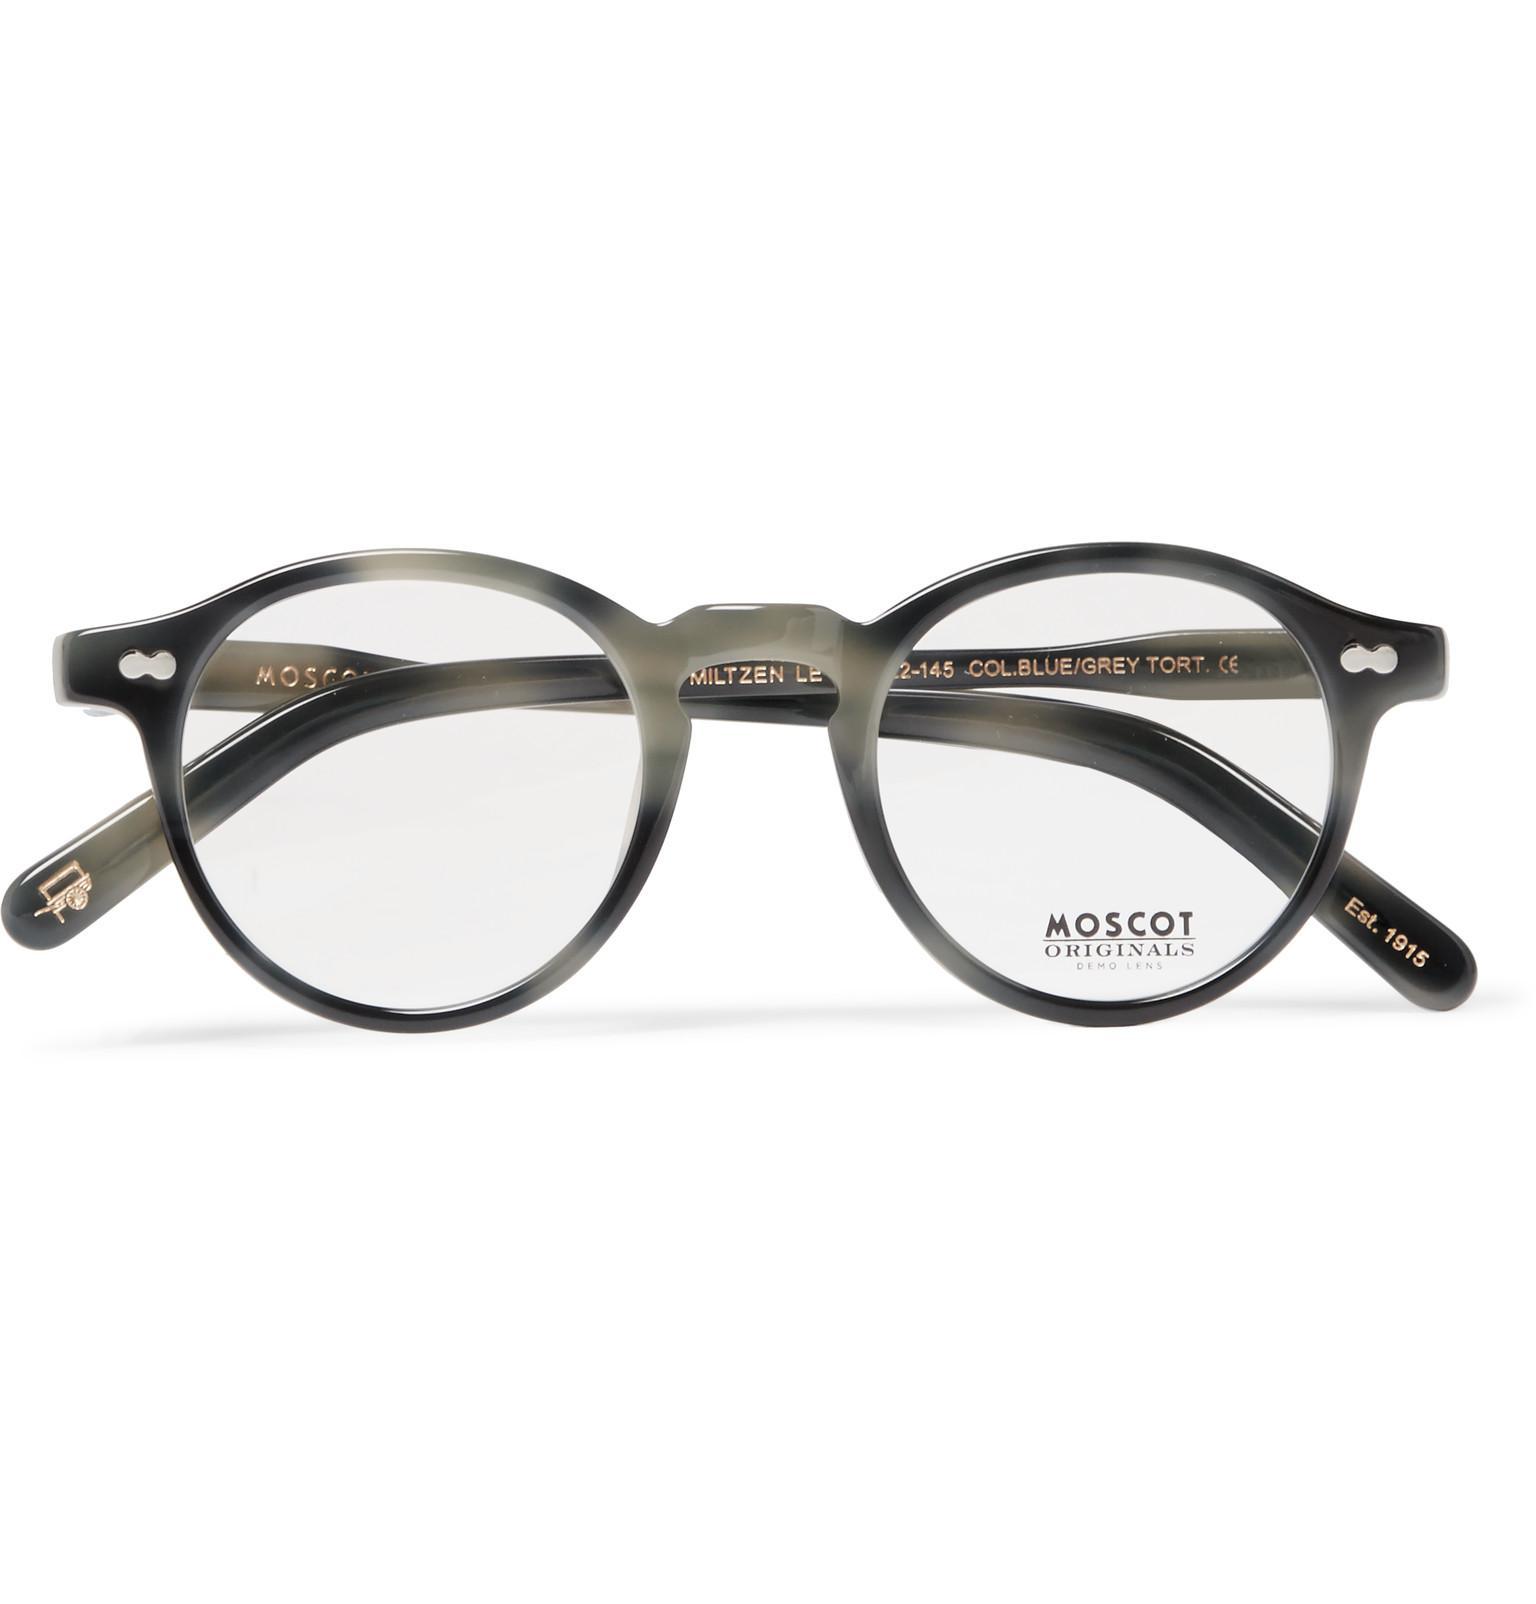 bc73c3d68ddc Lyst - Moscot Miltzen Round-frame Acetate Sunglasses in Gray for Men